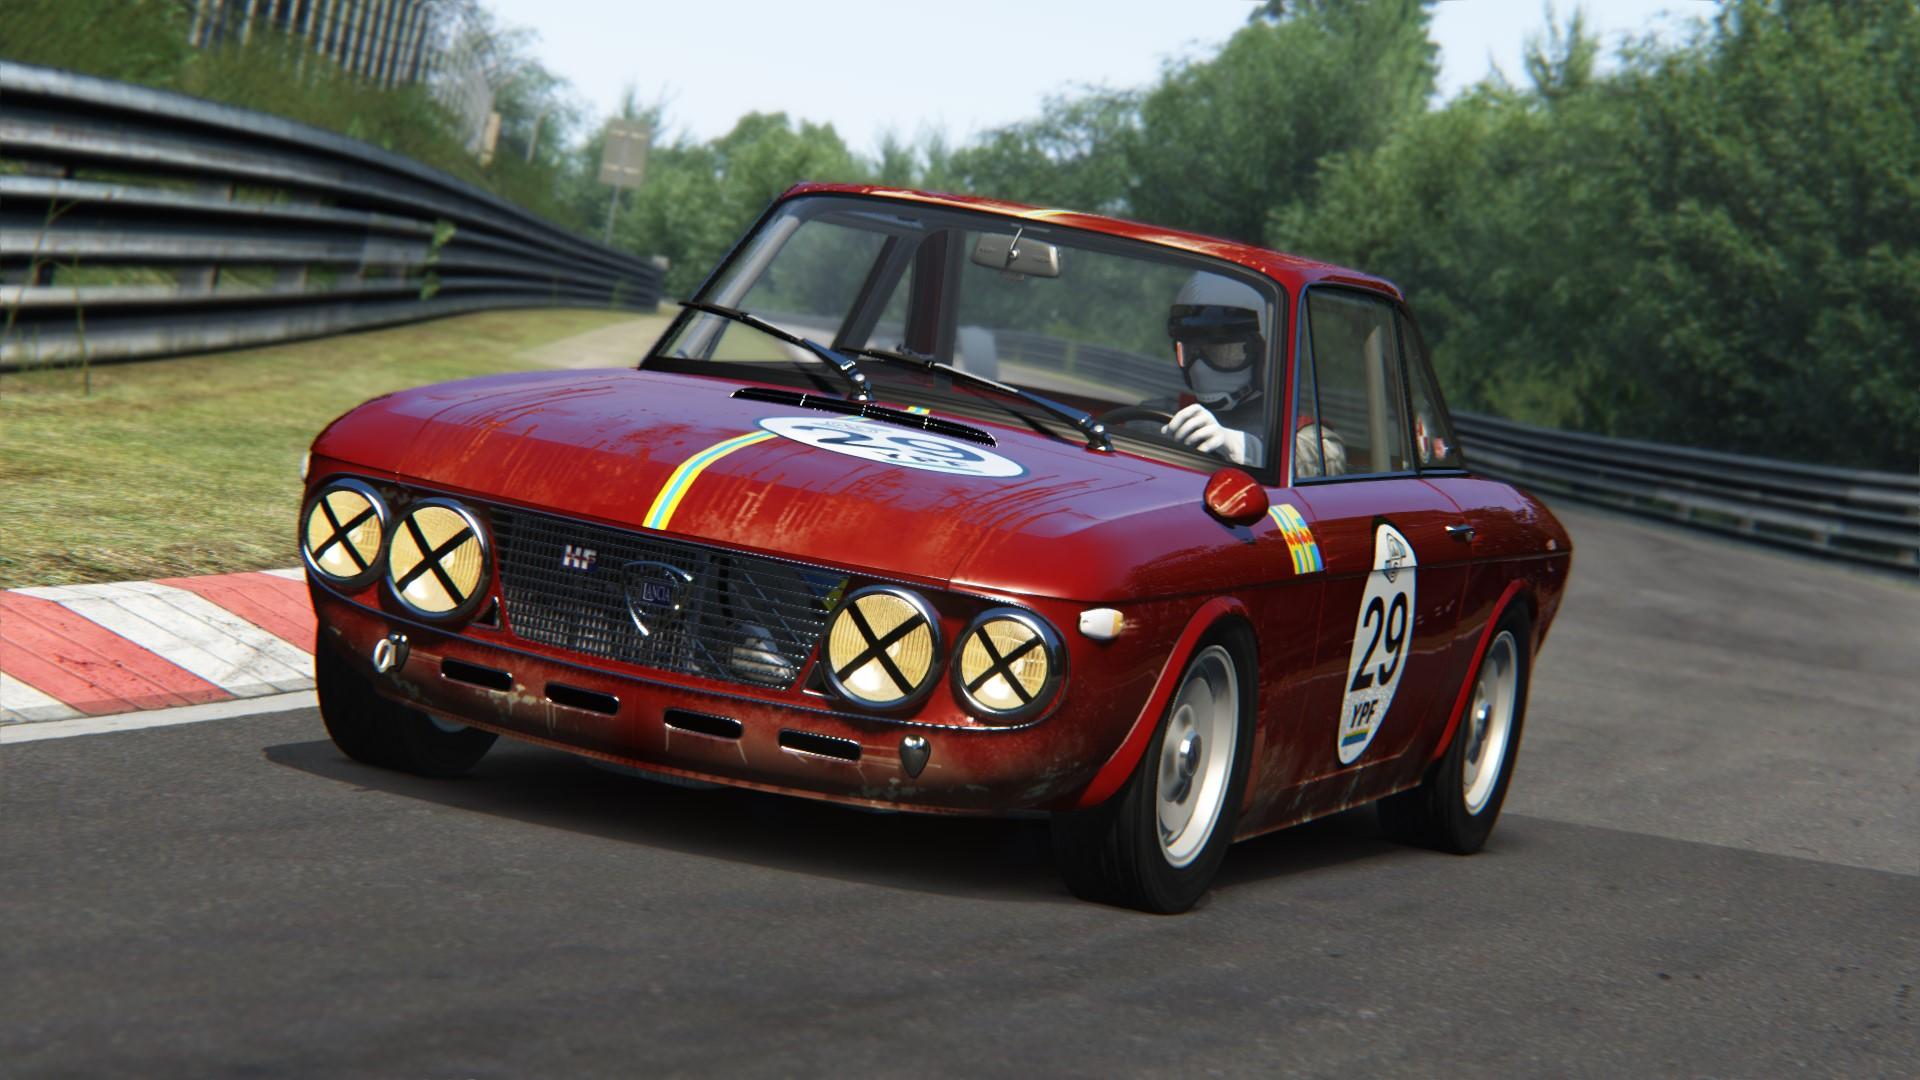 Lancia Fulvia 1 6 Hf Assetto Corsa Mods